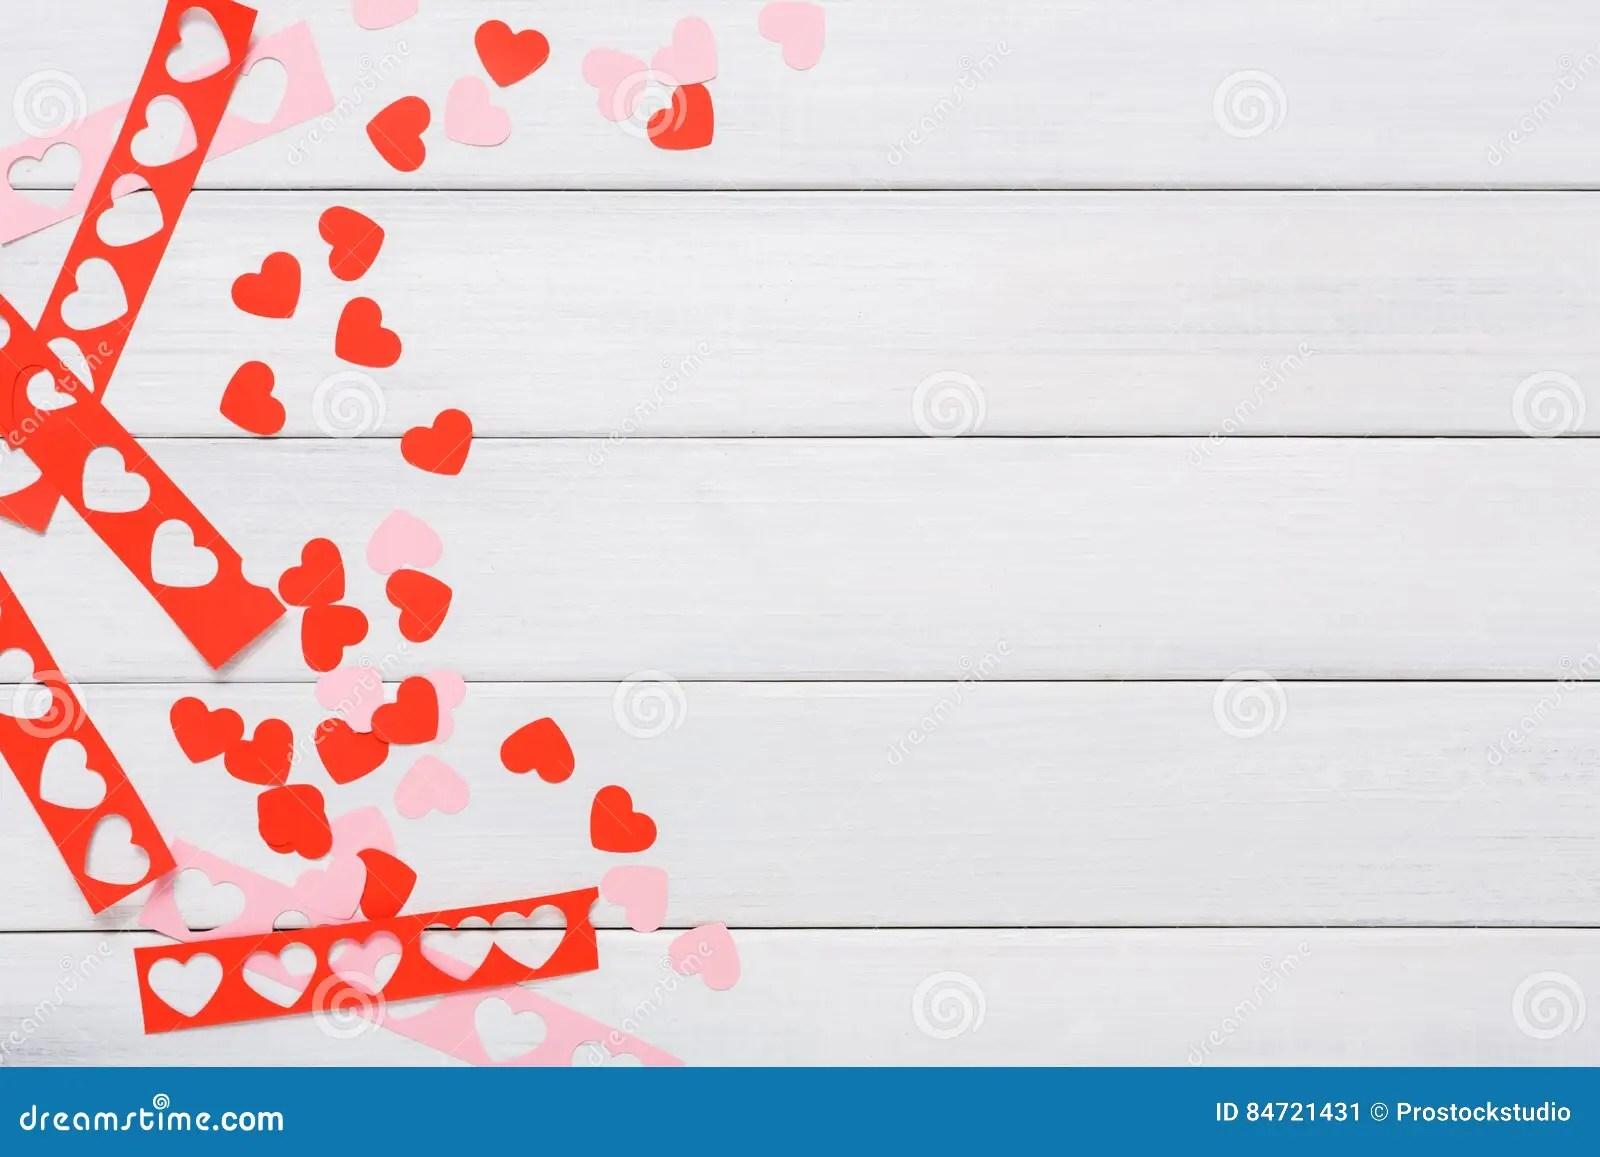 Valentine Day Handmade Scrapbooking Background Cut And